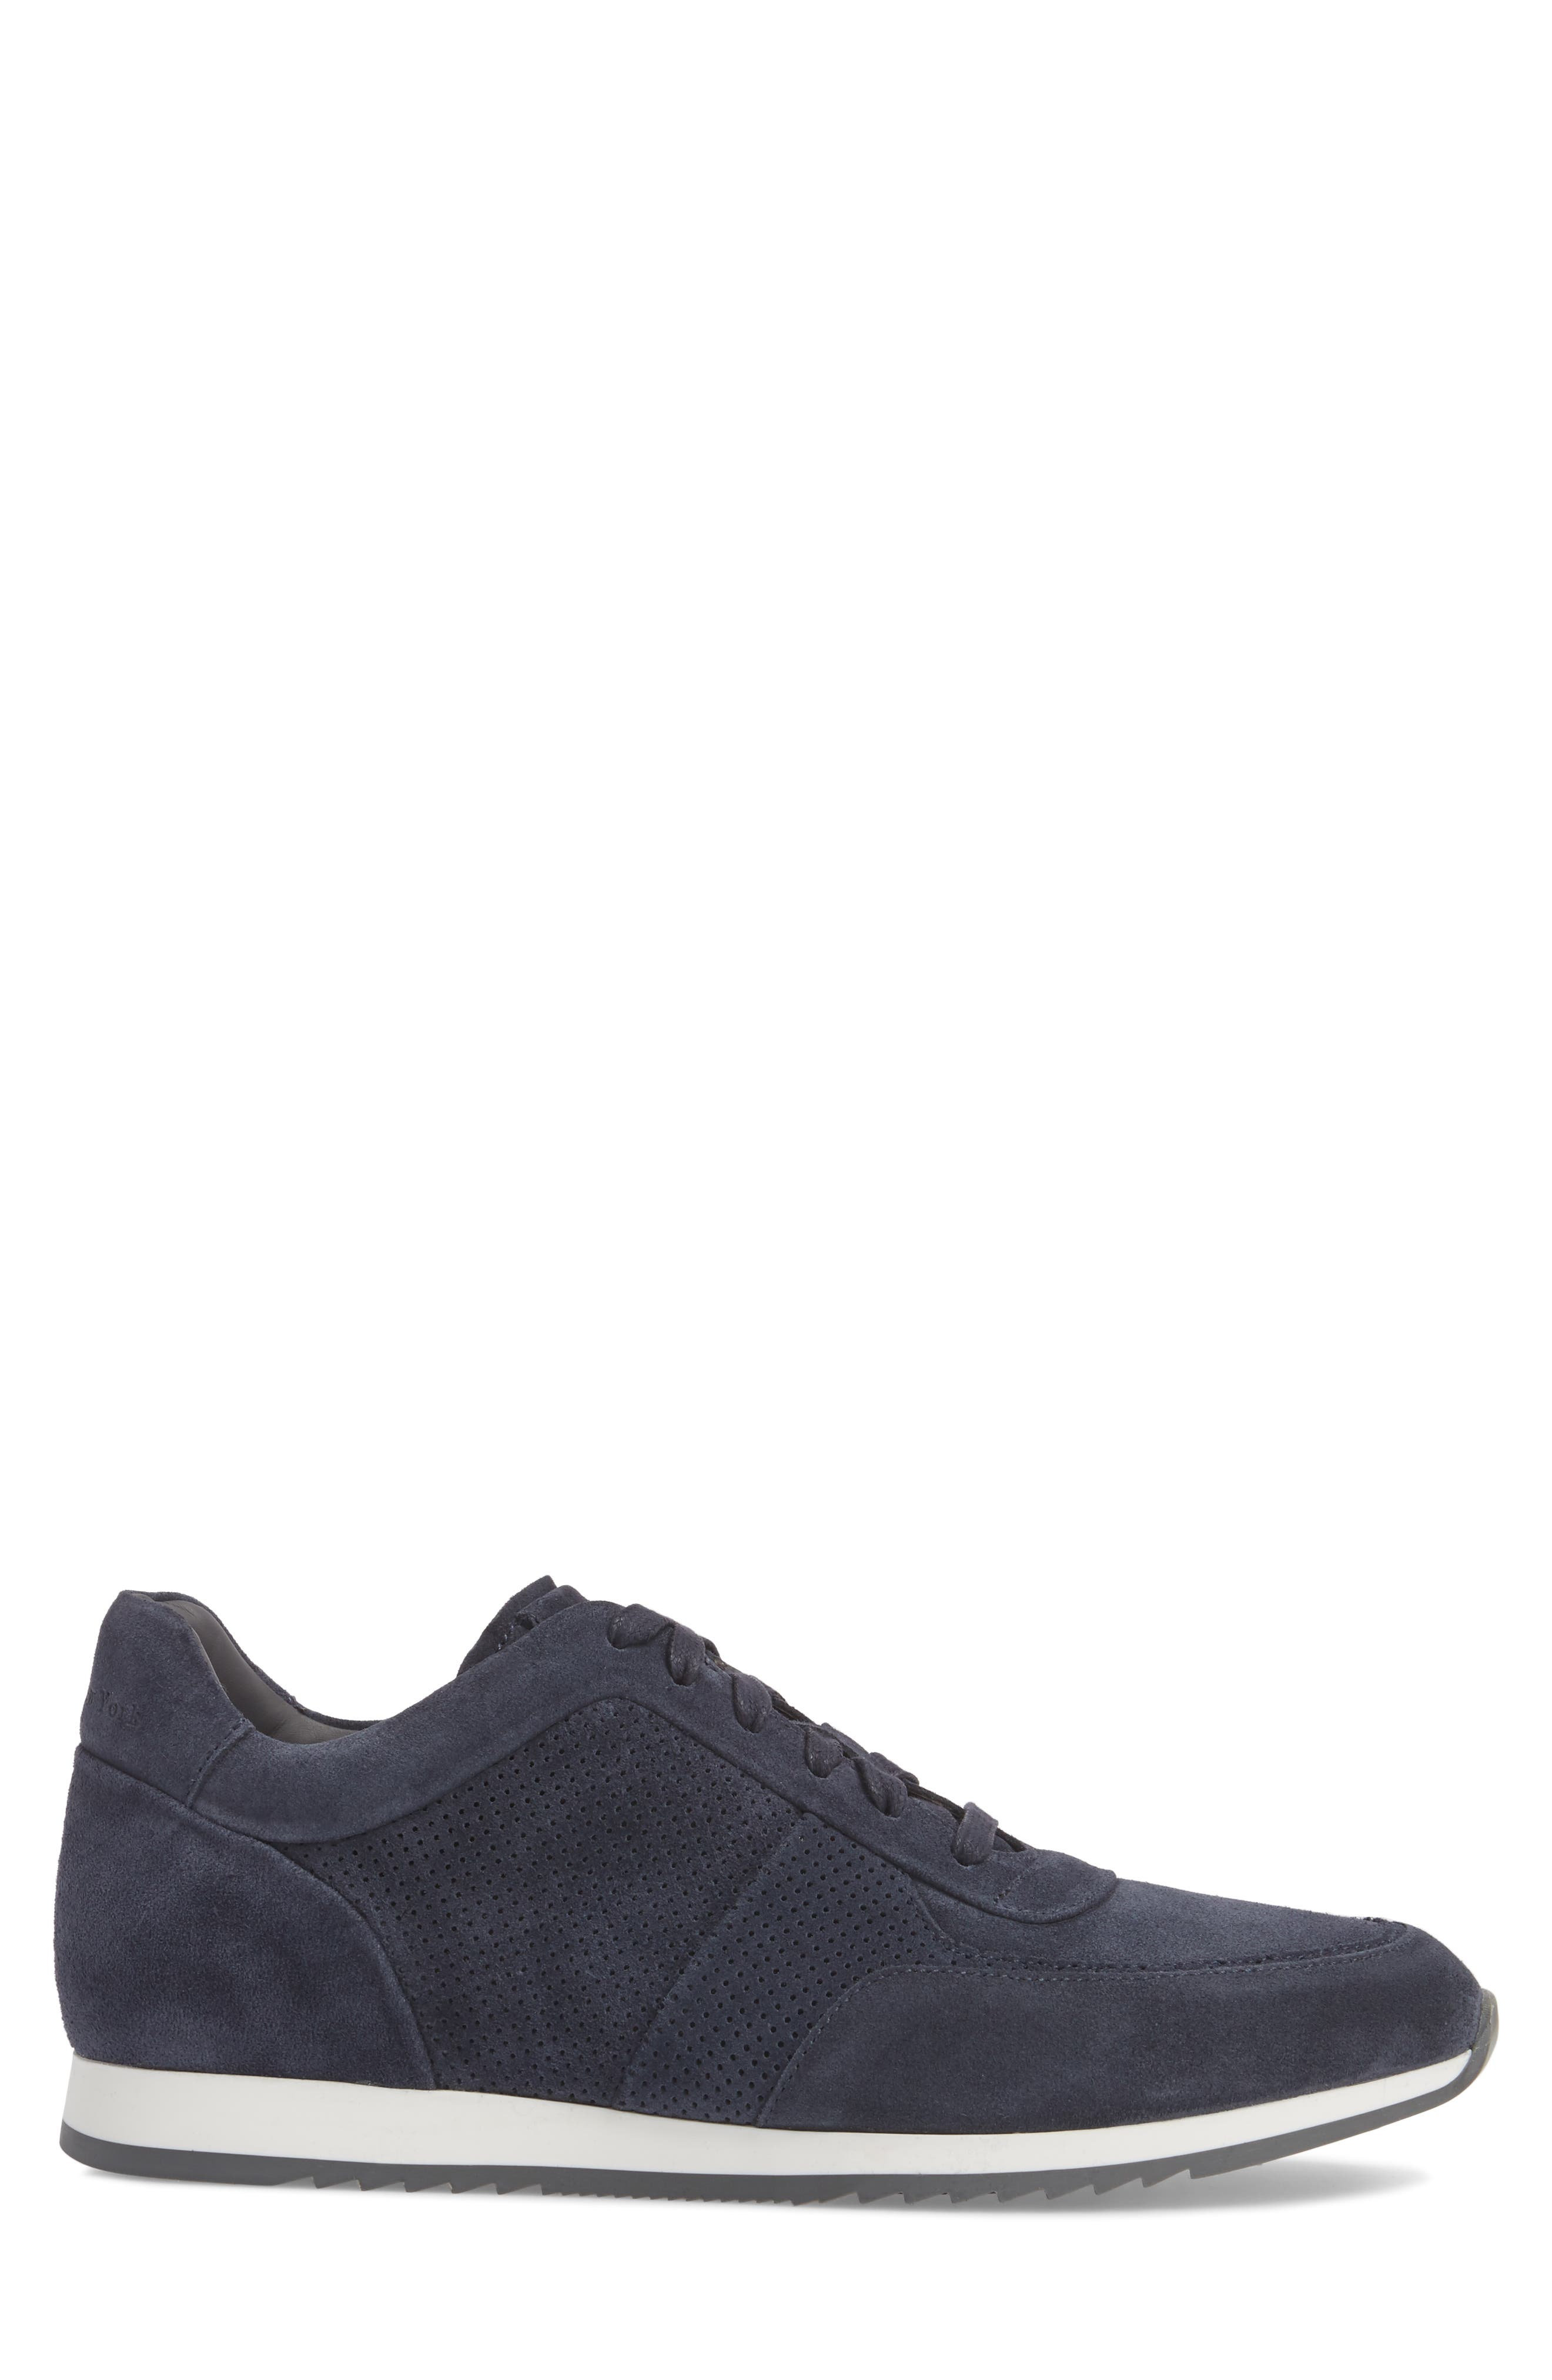 Fordham Low Top Sneaker,                             Alternate thumbnail 3, color,                             Space Blue Suede